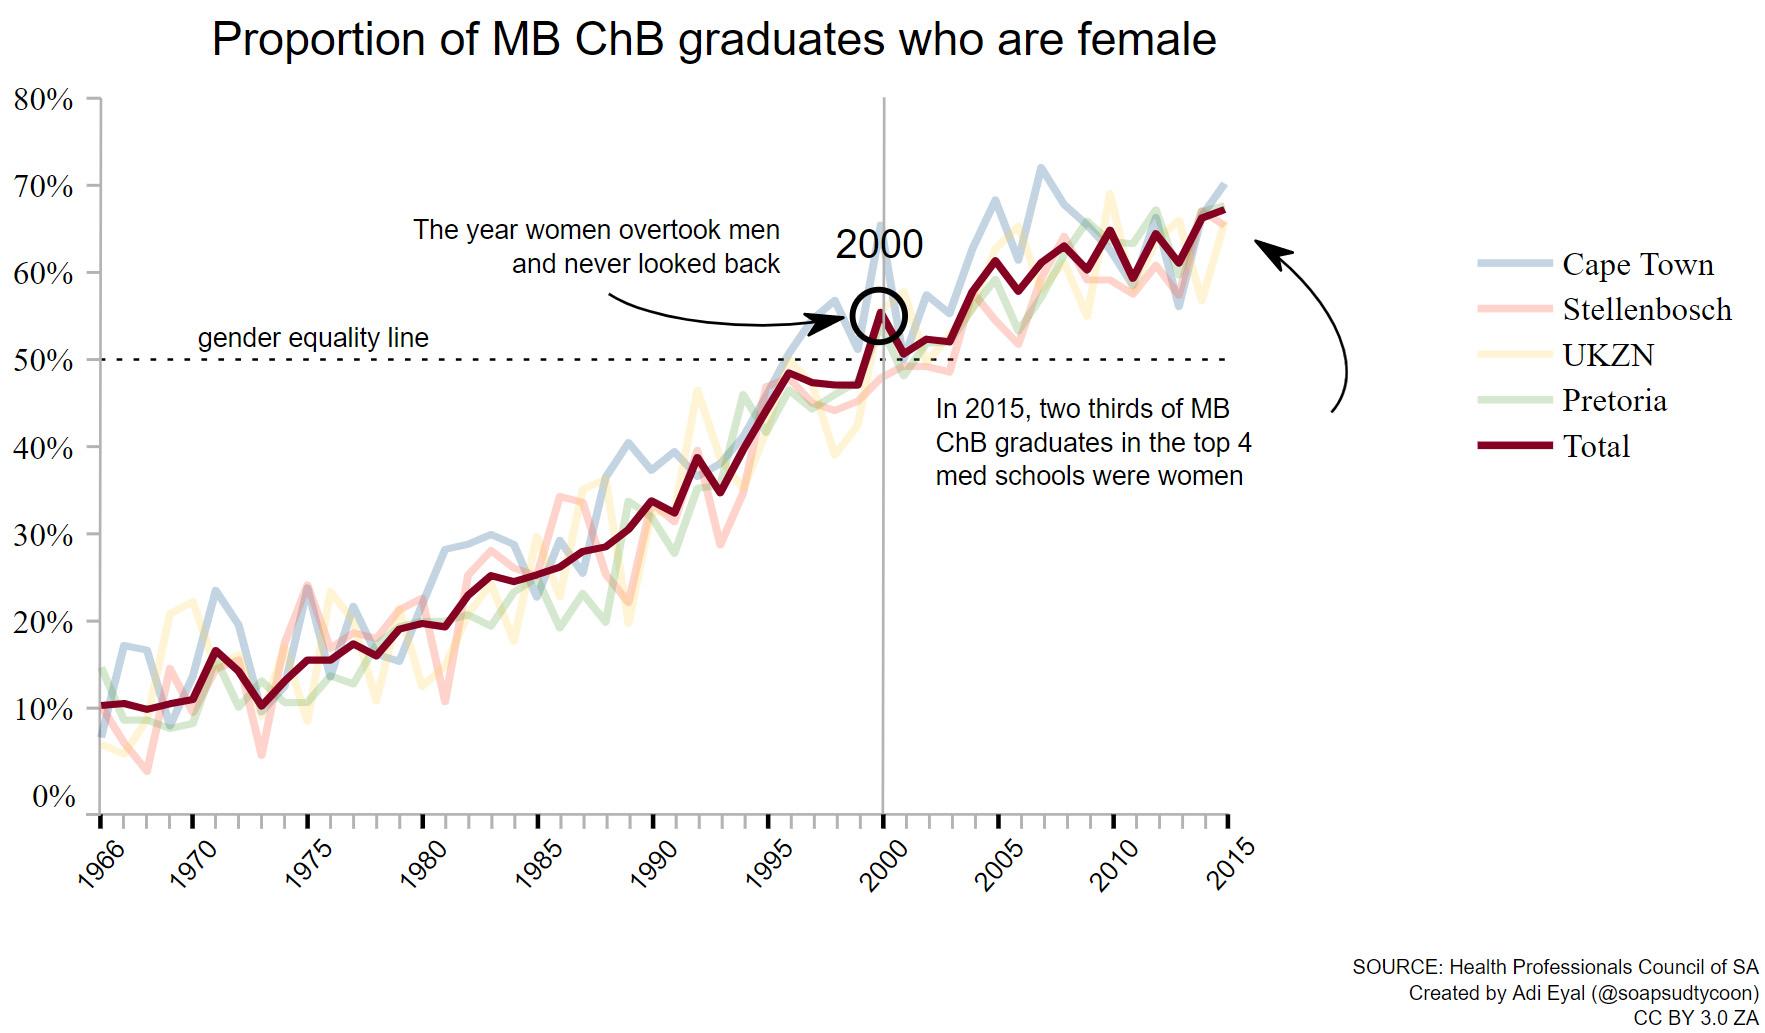 Chart showing percentage of female graduates